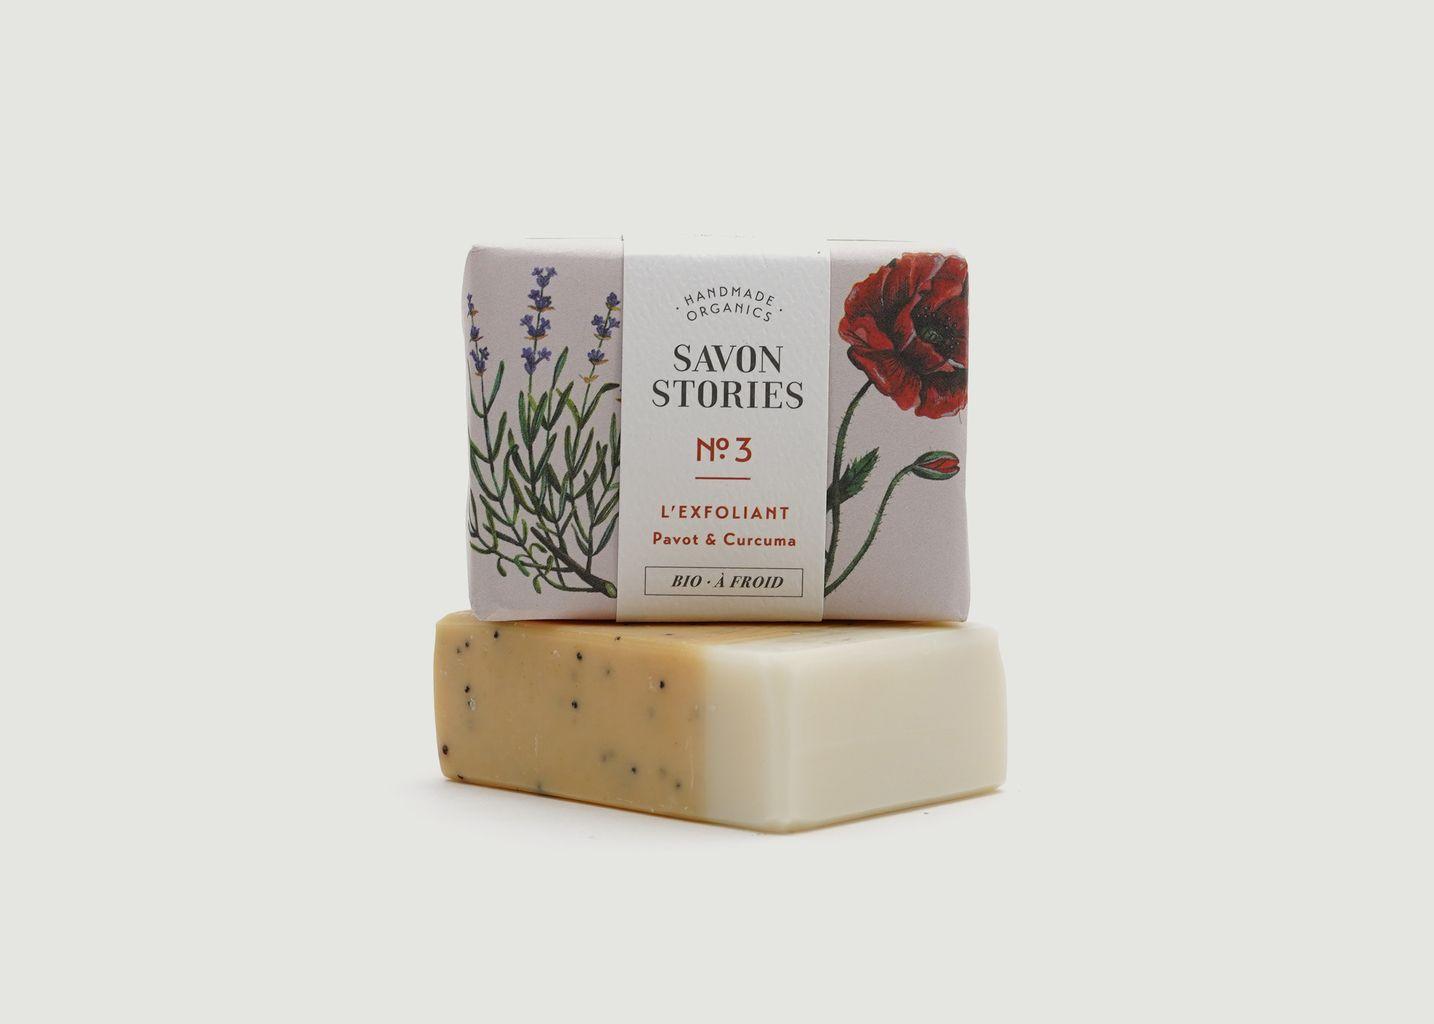 Savon Graines de Pavot - Savon Stories